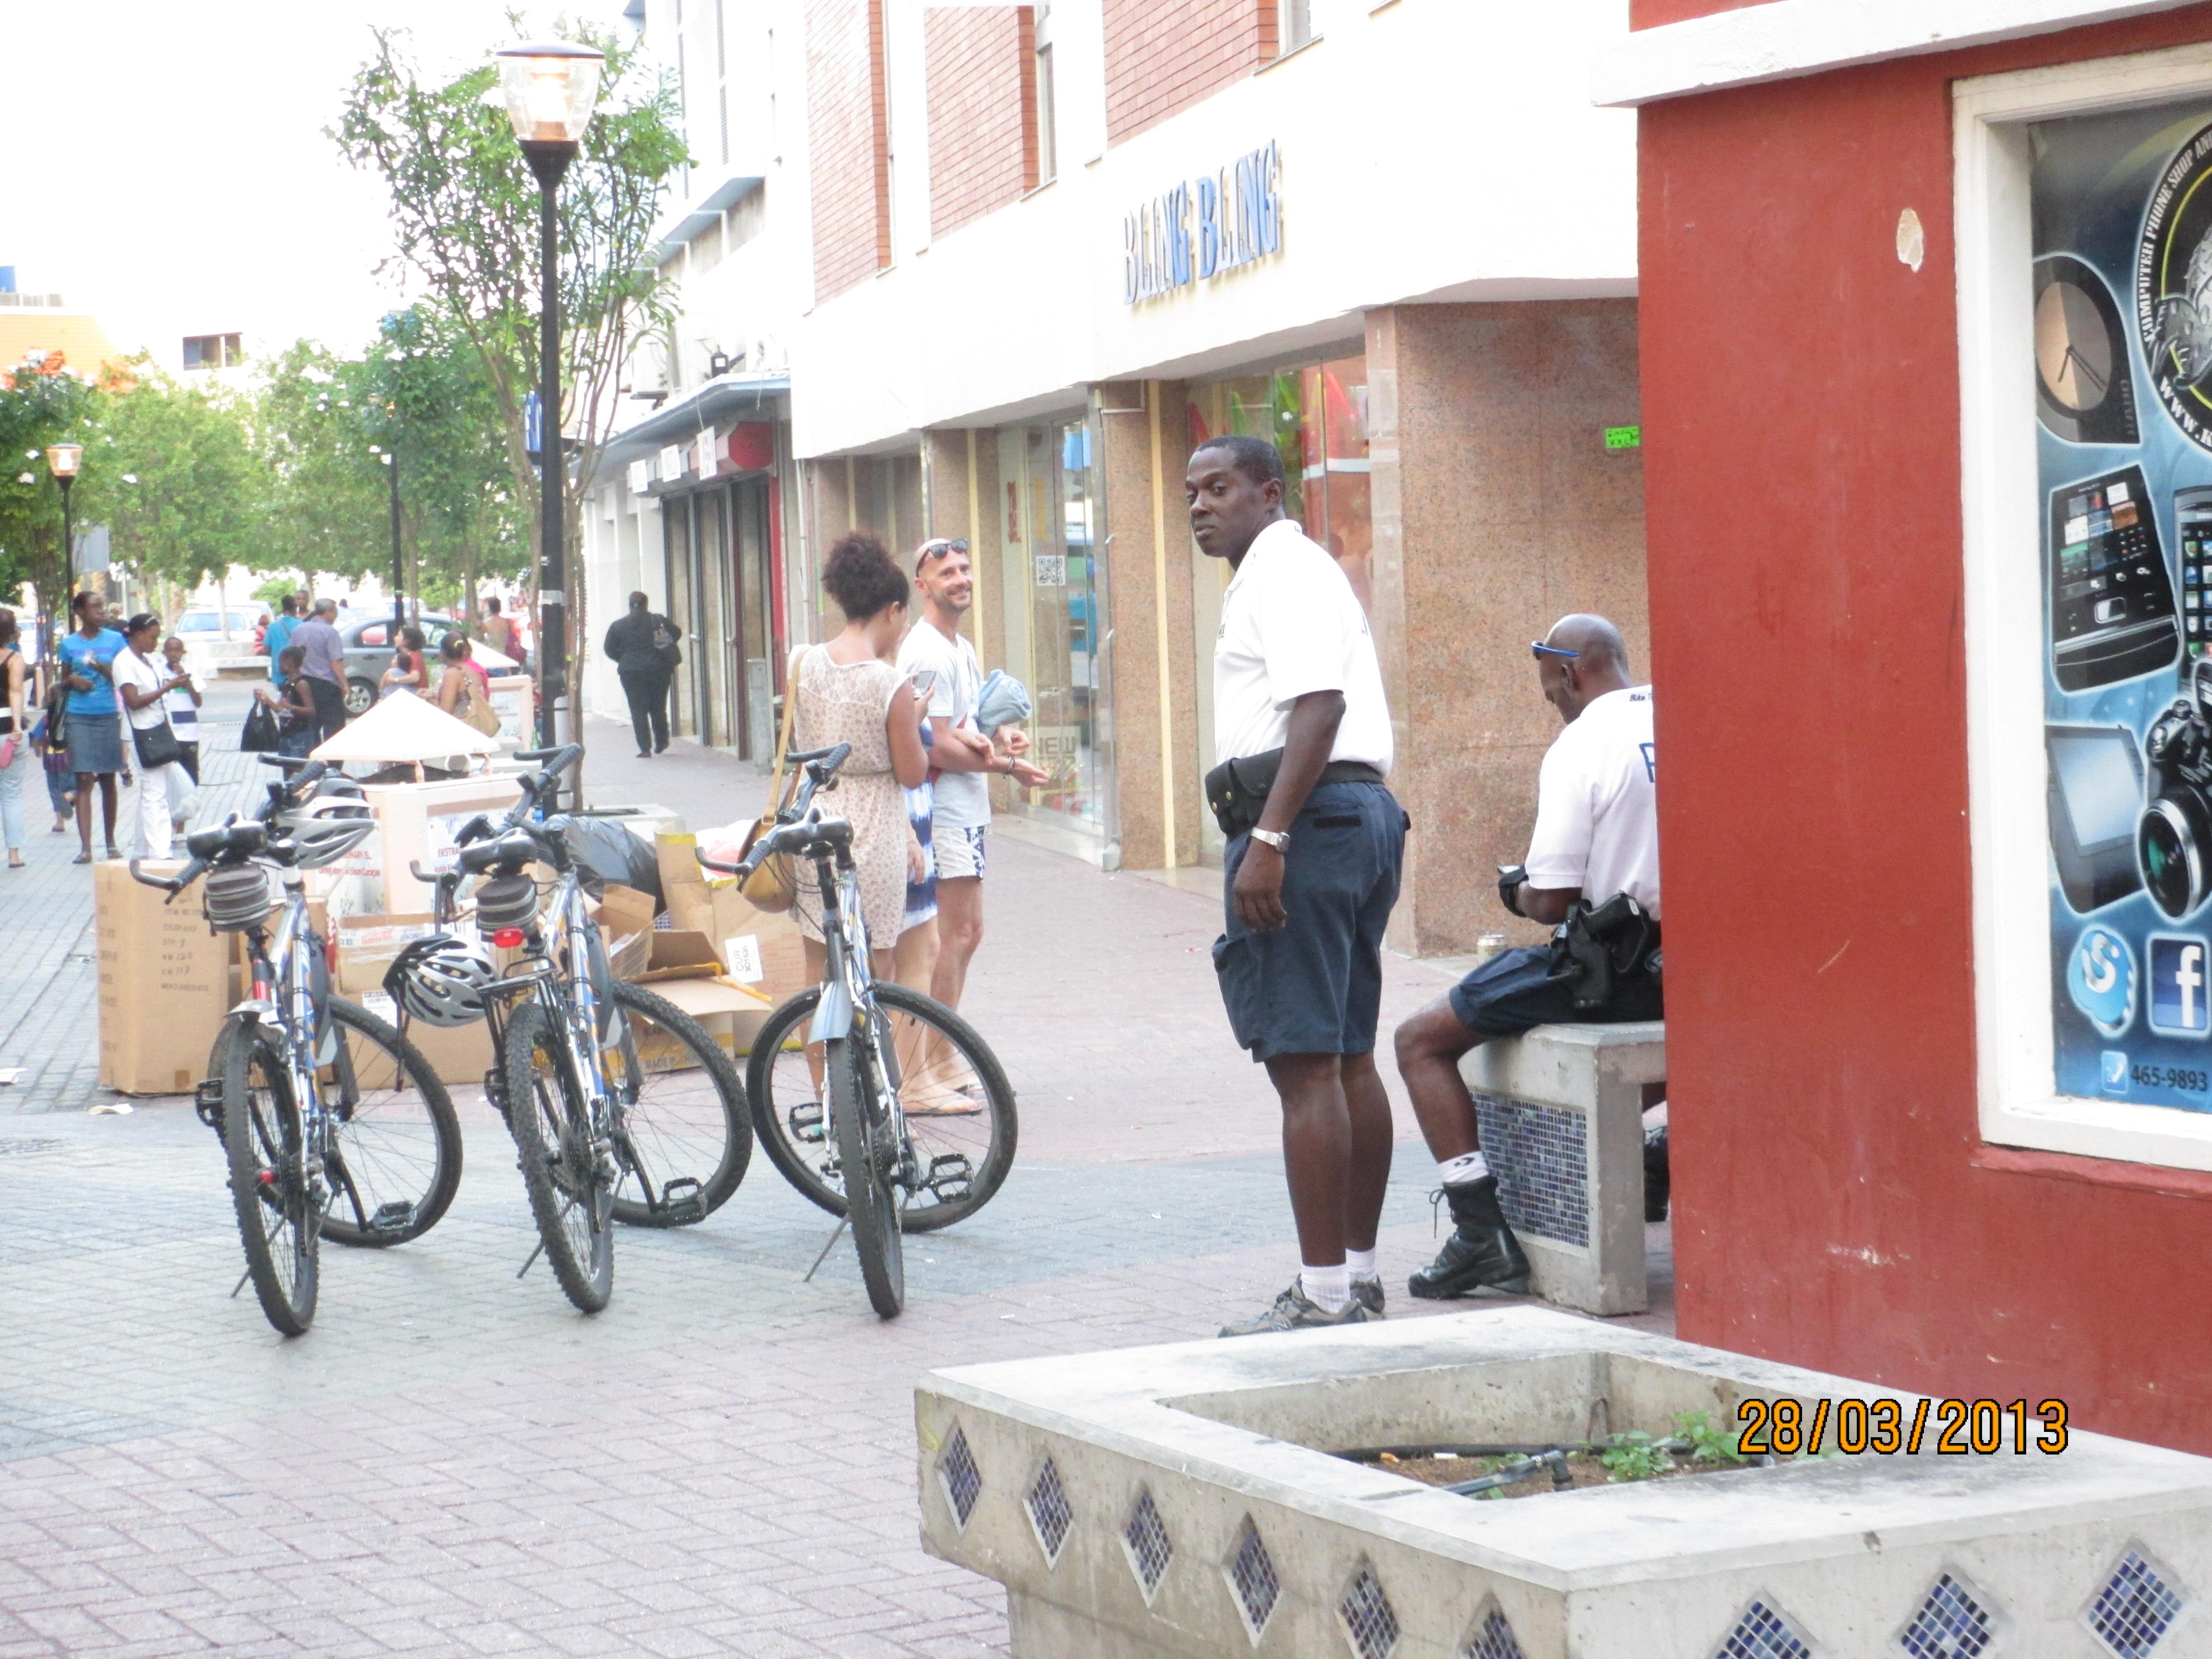 Bike police